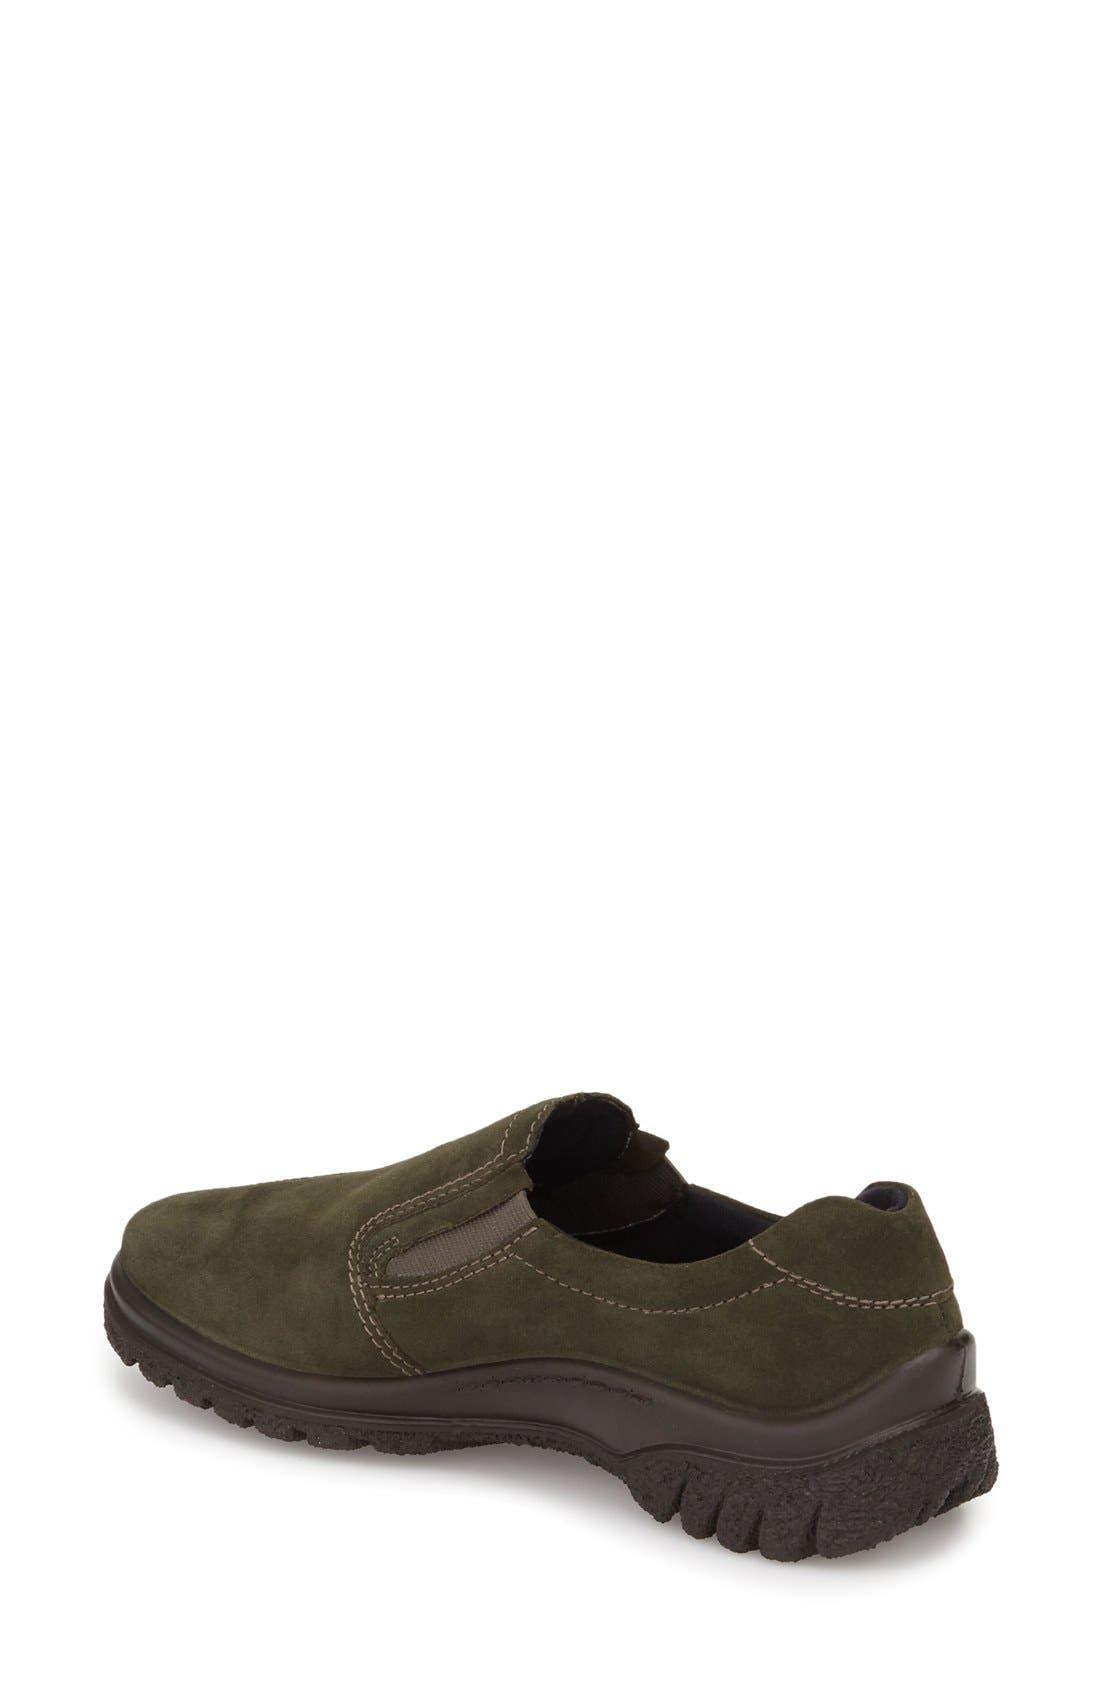 Parson Waterproof Gore-Tex<sup>®</sup> Slip-On Sneaker,                             Alternate thumbnail 2, color,                             Olive Suede